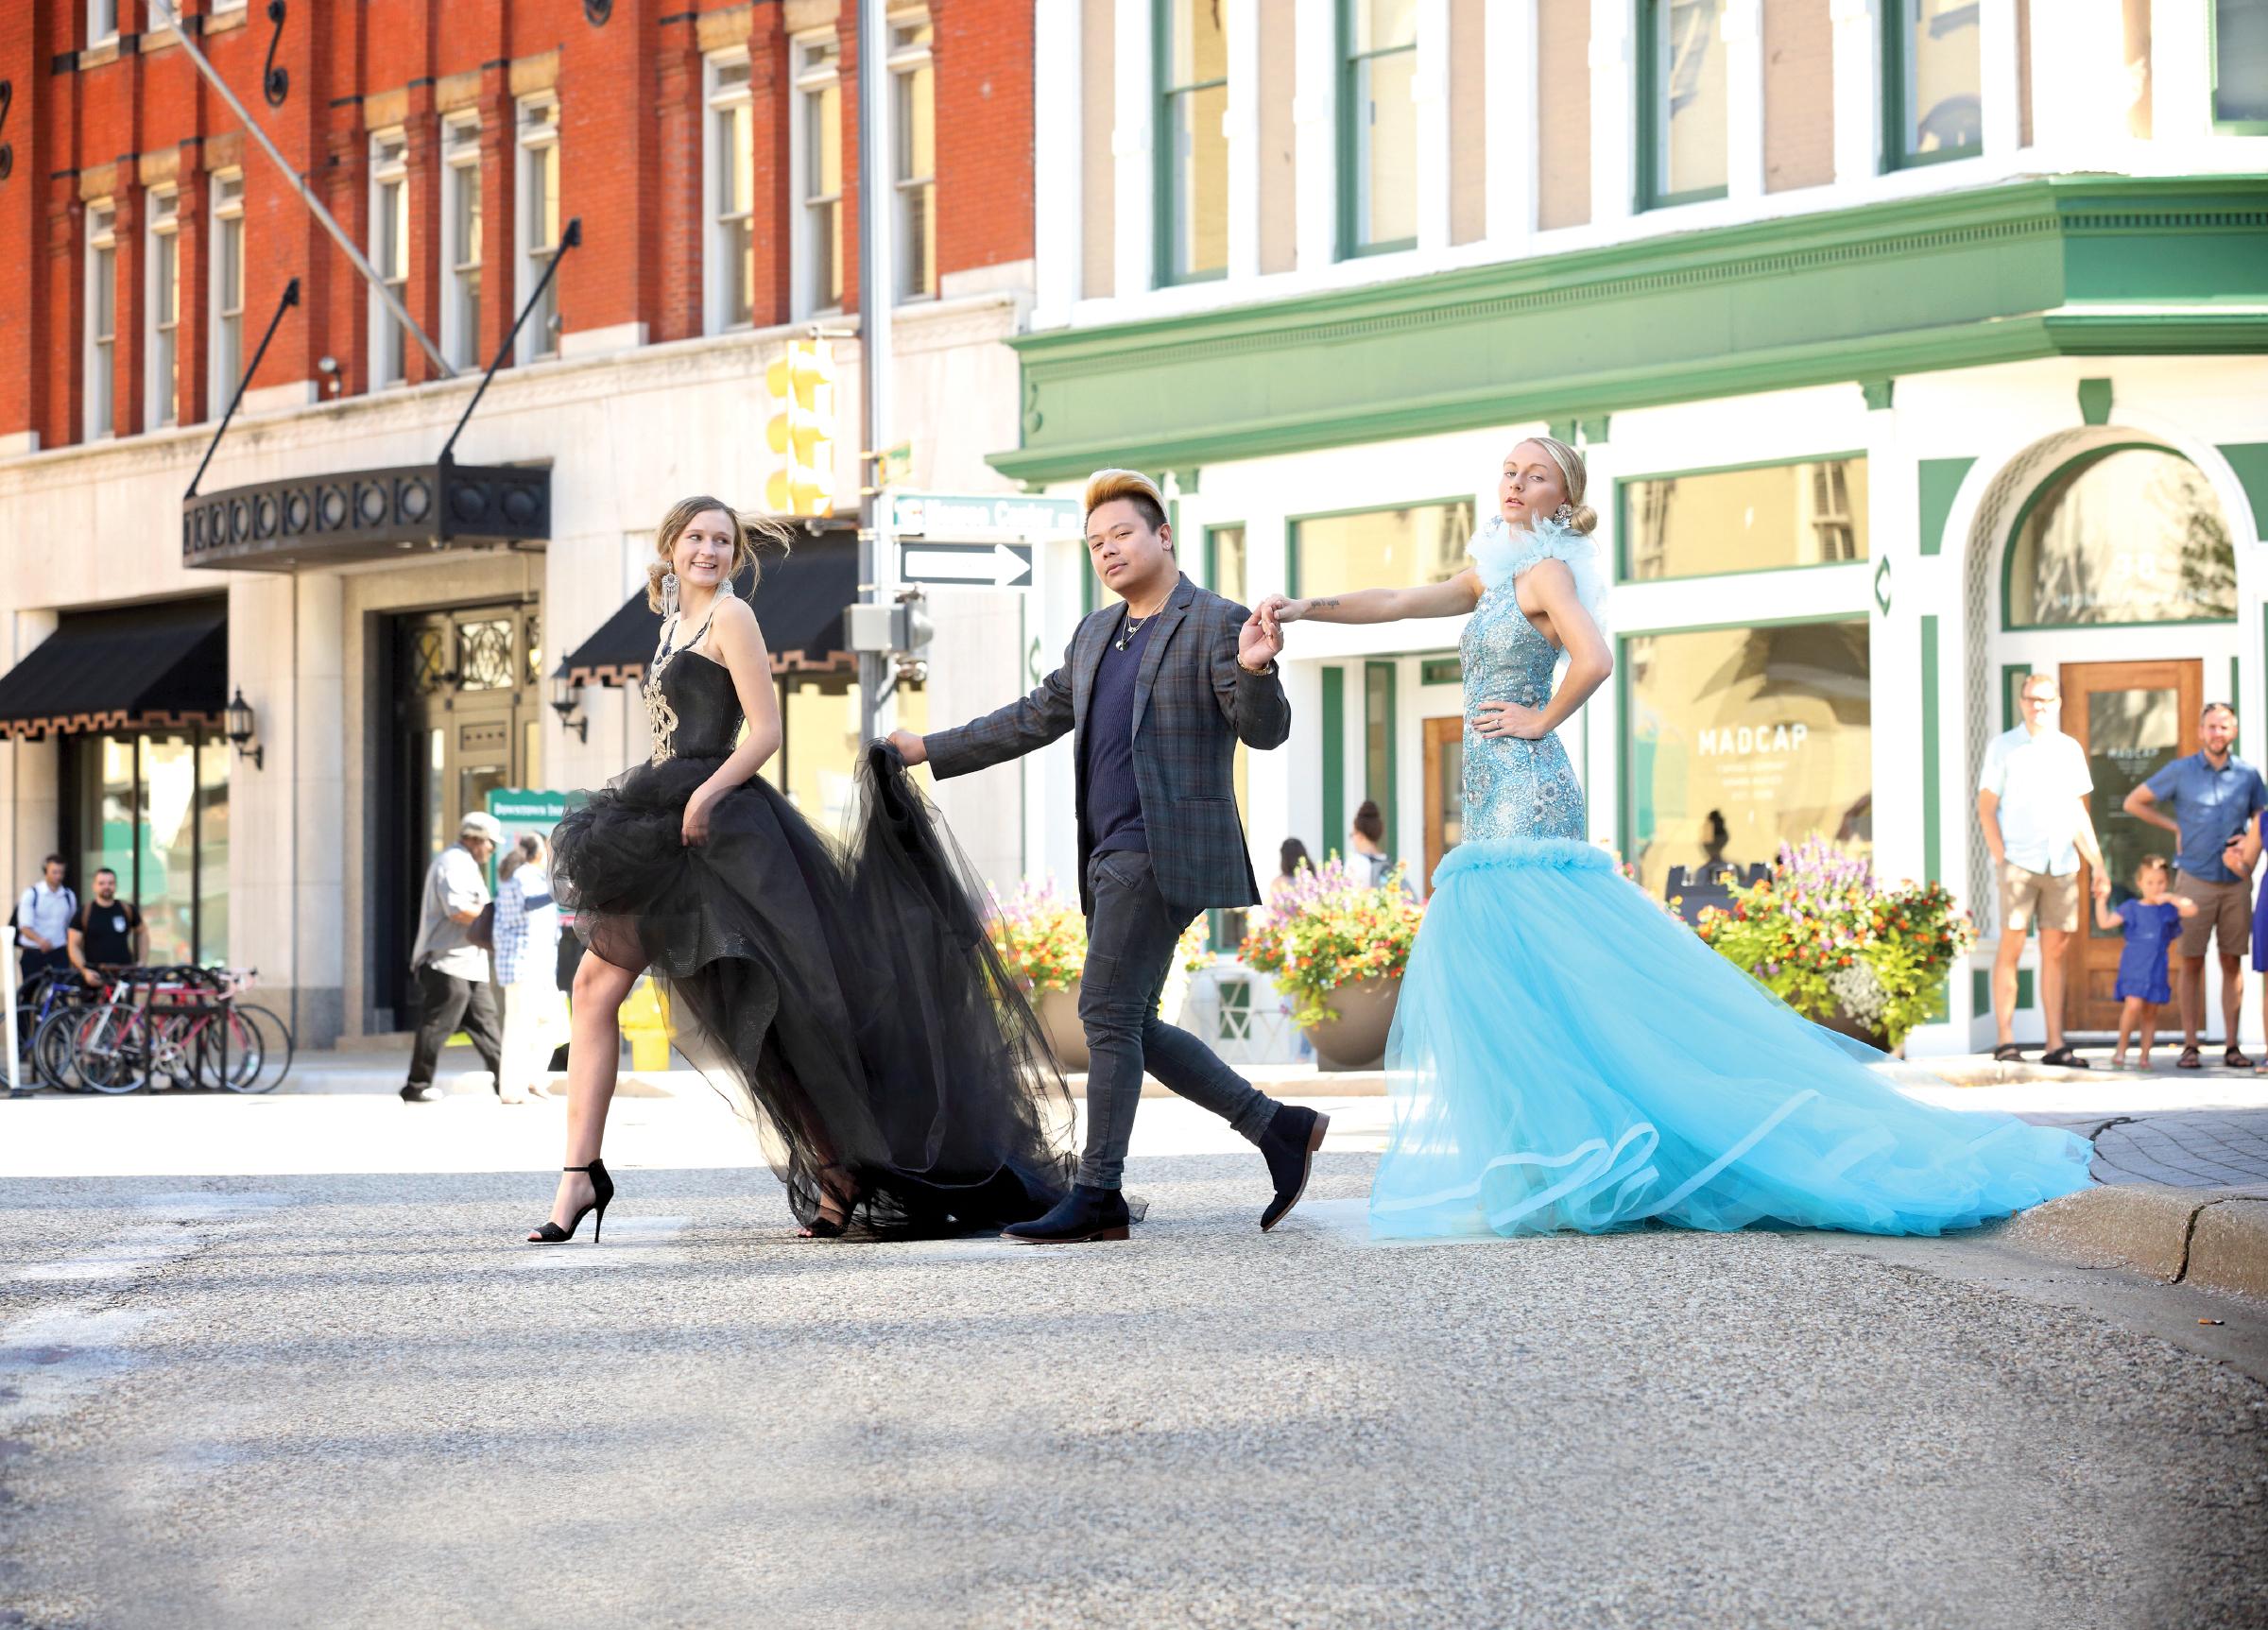 Models Mackenzie Santamour (Blue), Marissa Faust (Black) with designer Romel Caylan. Photo by Johnny Quirin.